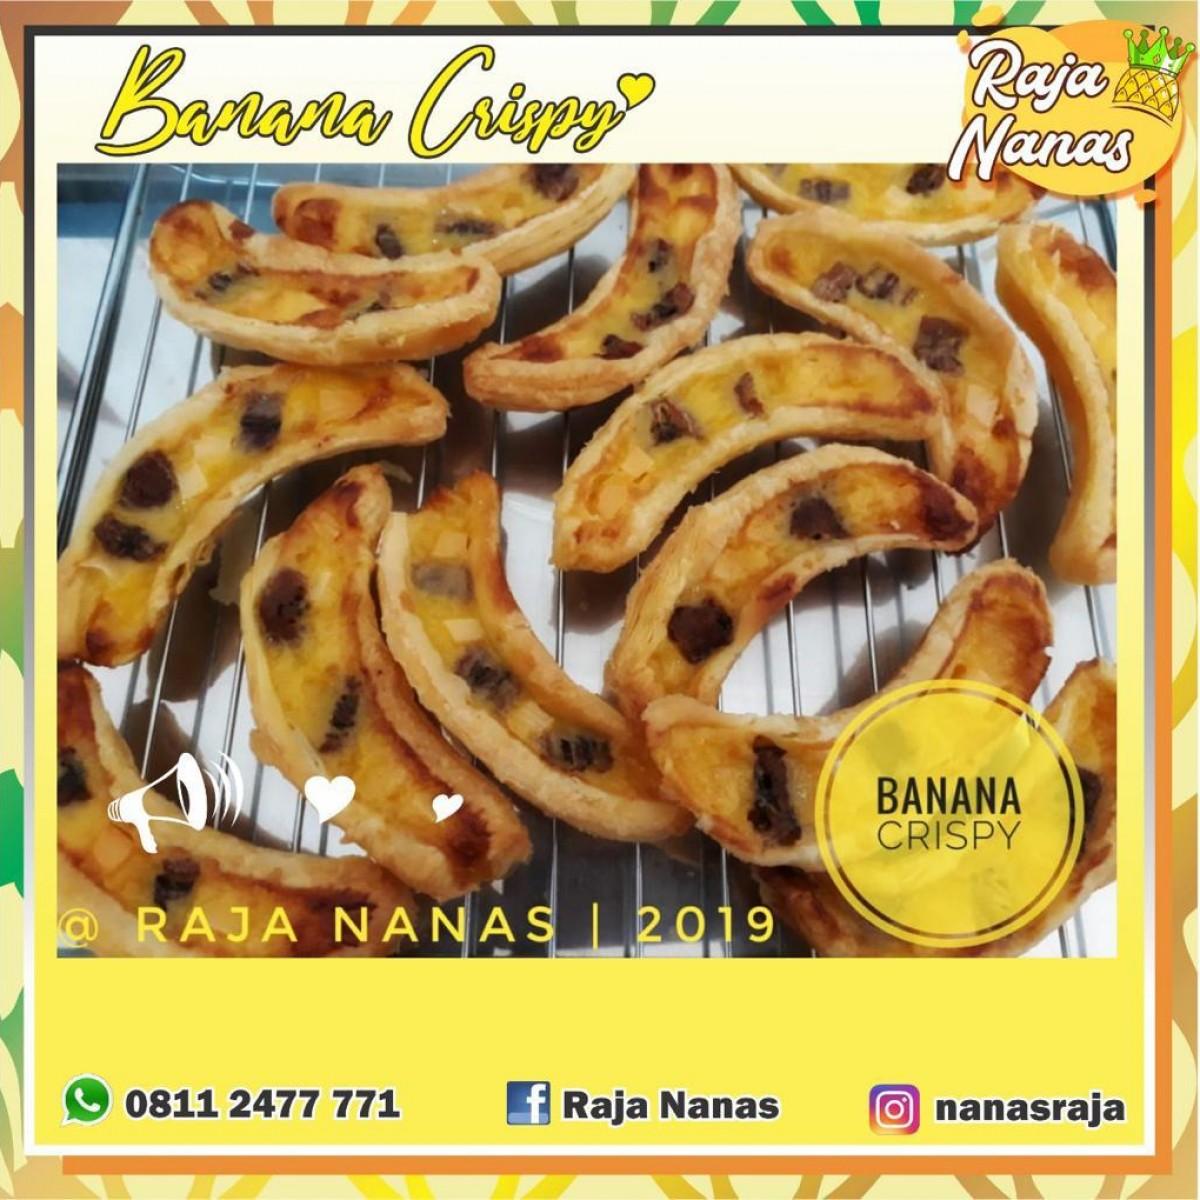 Banana crispy